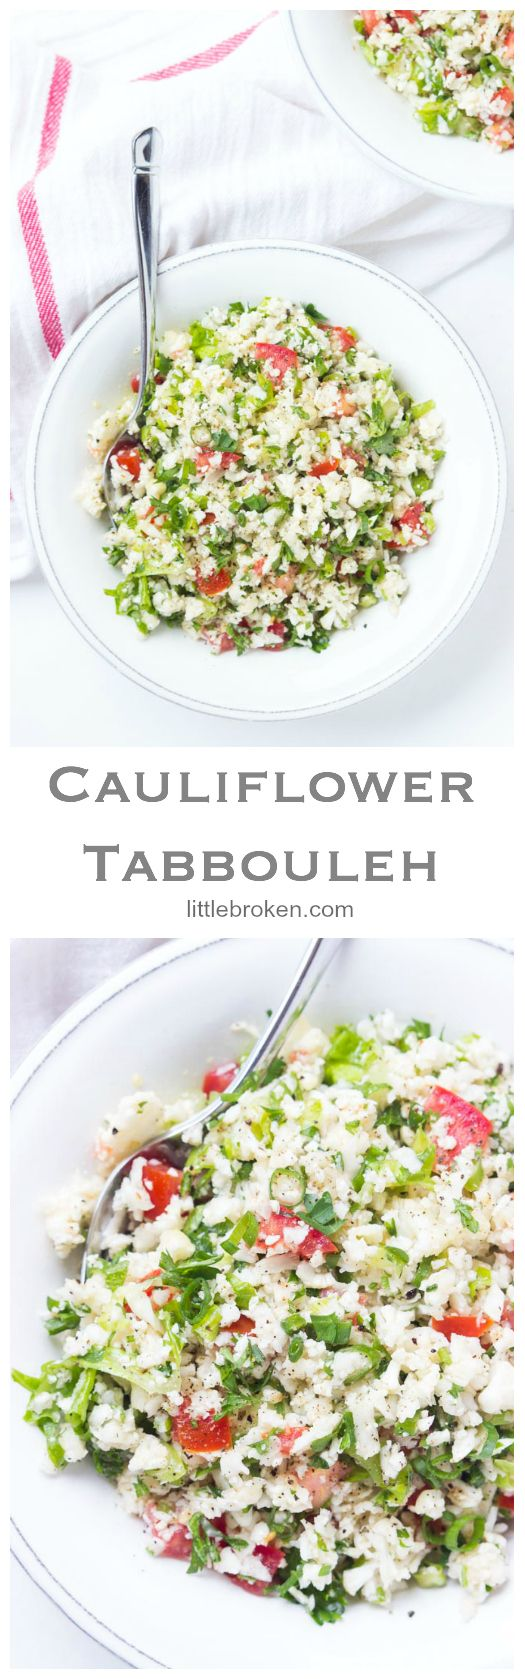 Veggie loaded tabbouleh with cauliflower instead of bulgur. Tossed in a 3 ingredient super delicious vinaigrette. Healthy vegetable side dish all the way! | littlebroken.com @littlebroken